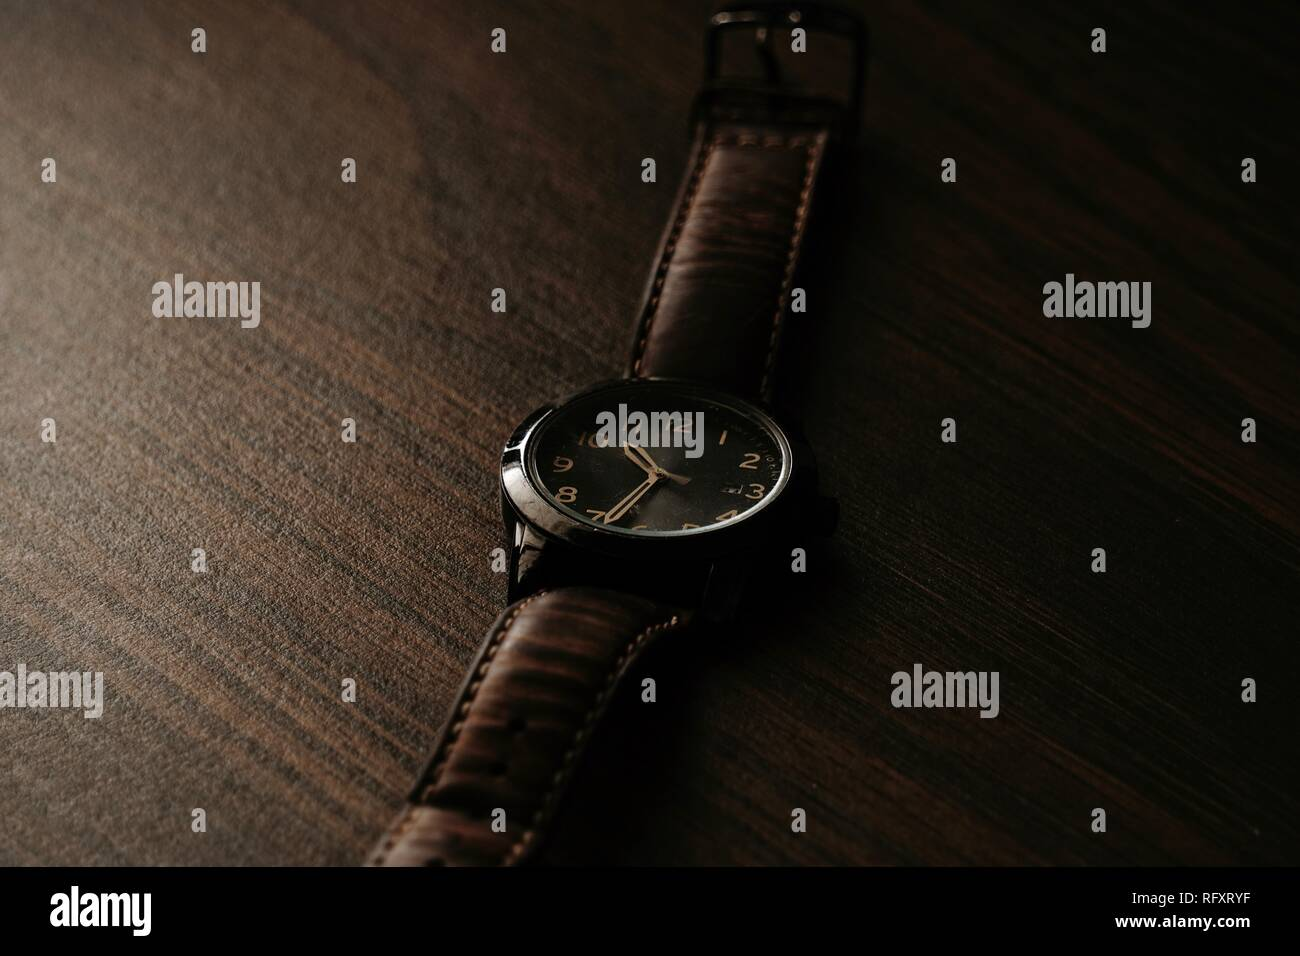 Mens Wrist Watch - Stock Image